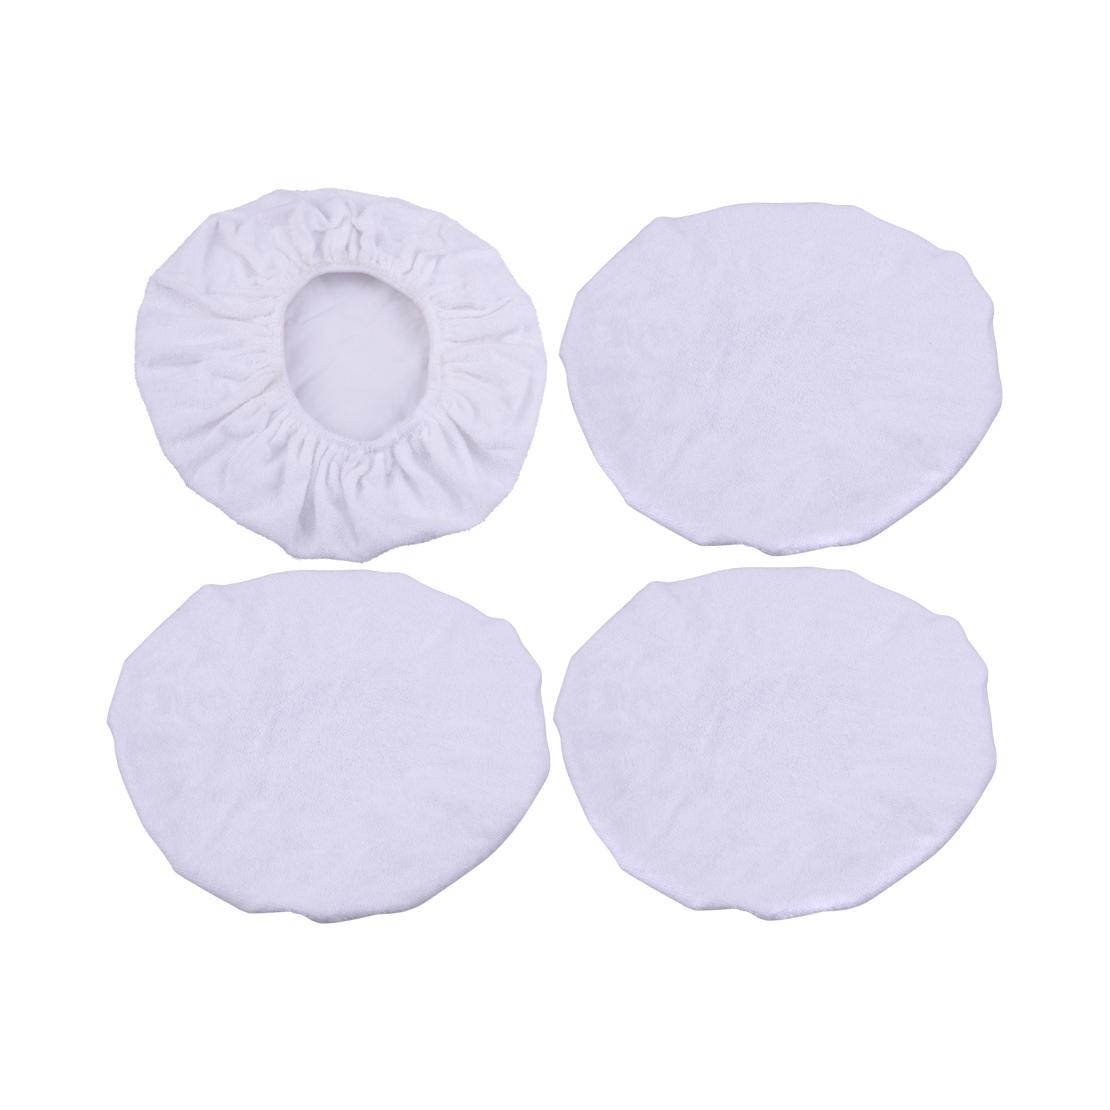 5PCS 9-10/'/' Plush Soft Car Polishing Waxing Bonnet Buffing Pad Cover Microfiber